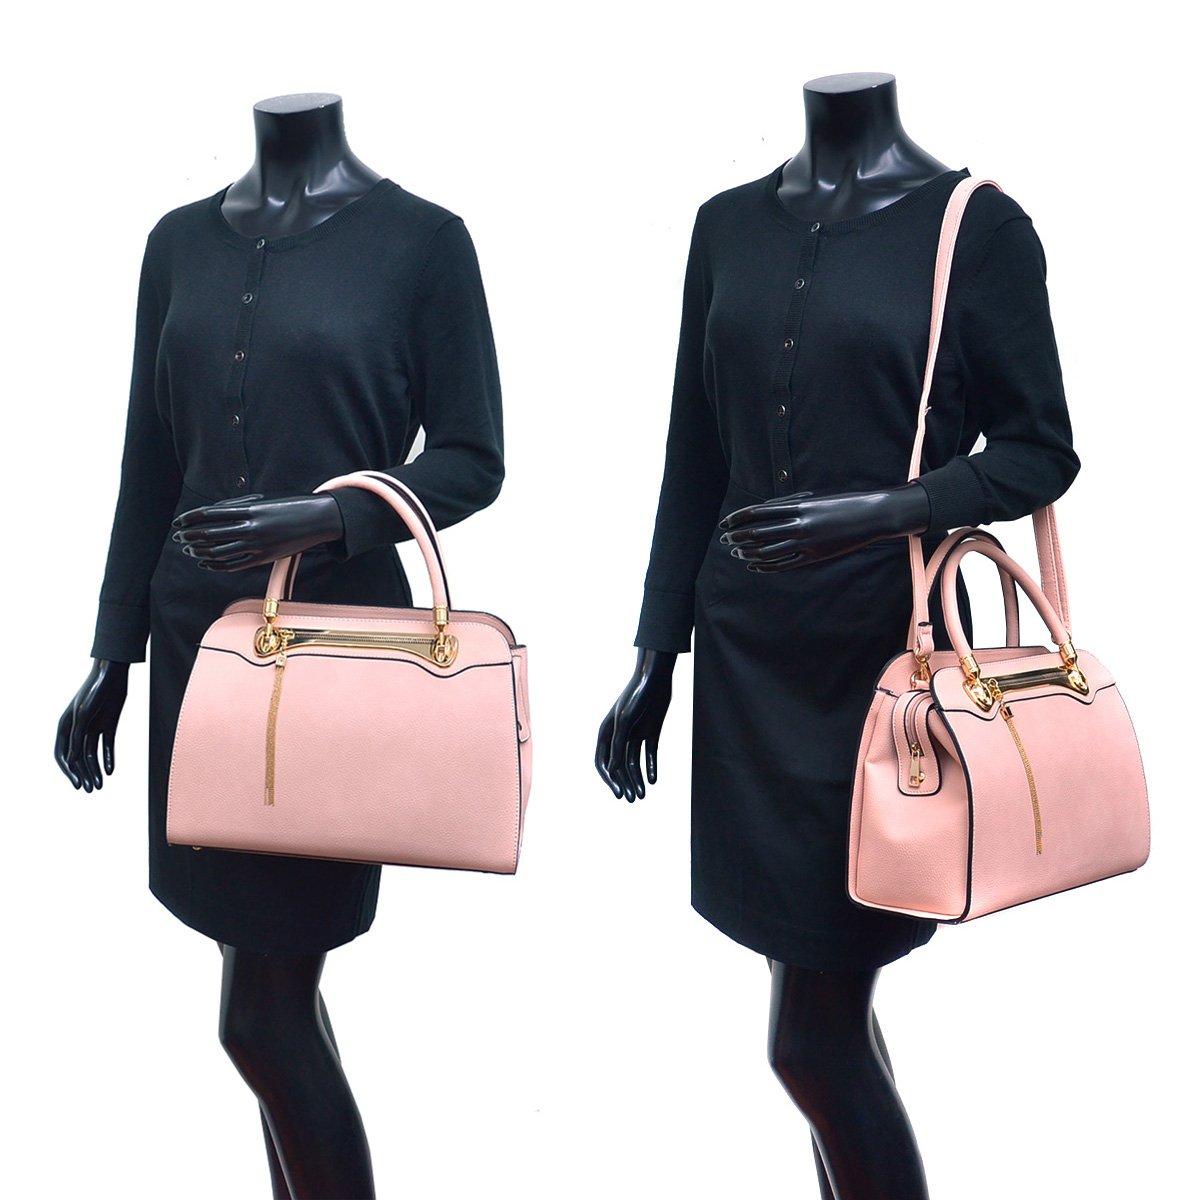 Women Structured Satchel Bags Vegan Leather Handbag Top Handle Purse Fashion Shoulder Bag with Fringed Tassel by Dasein (Image #6)